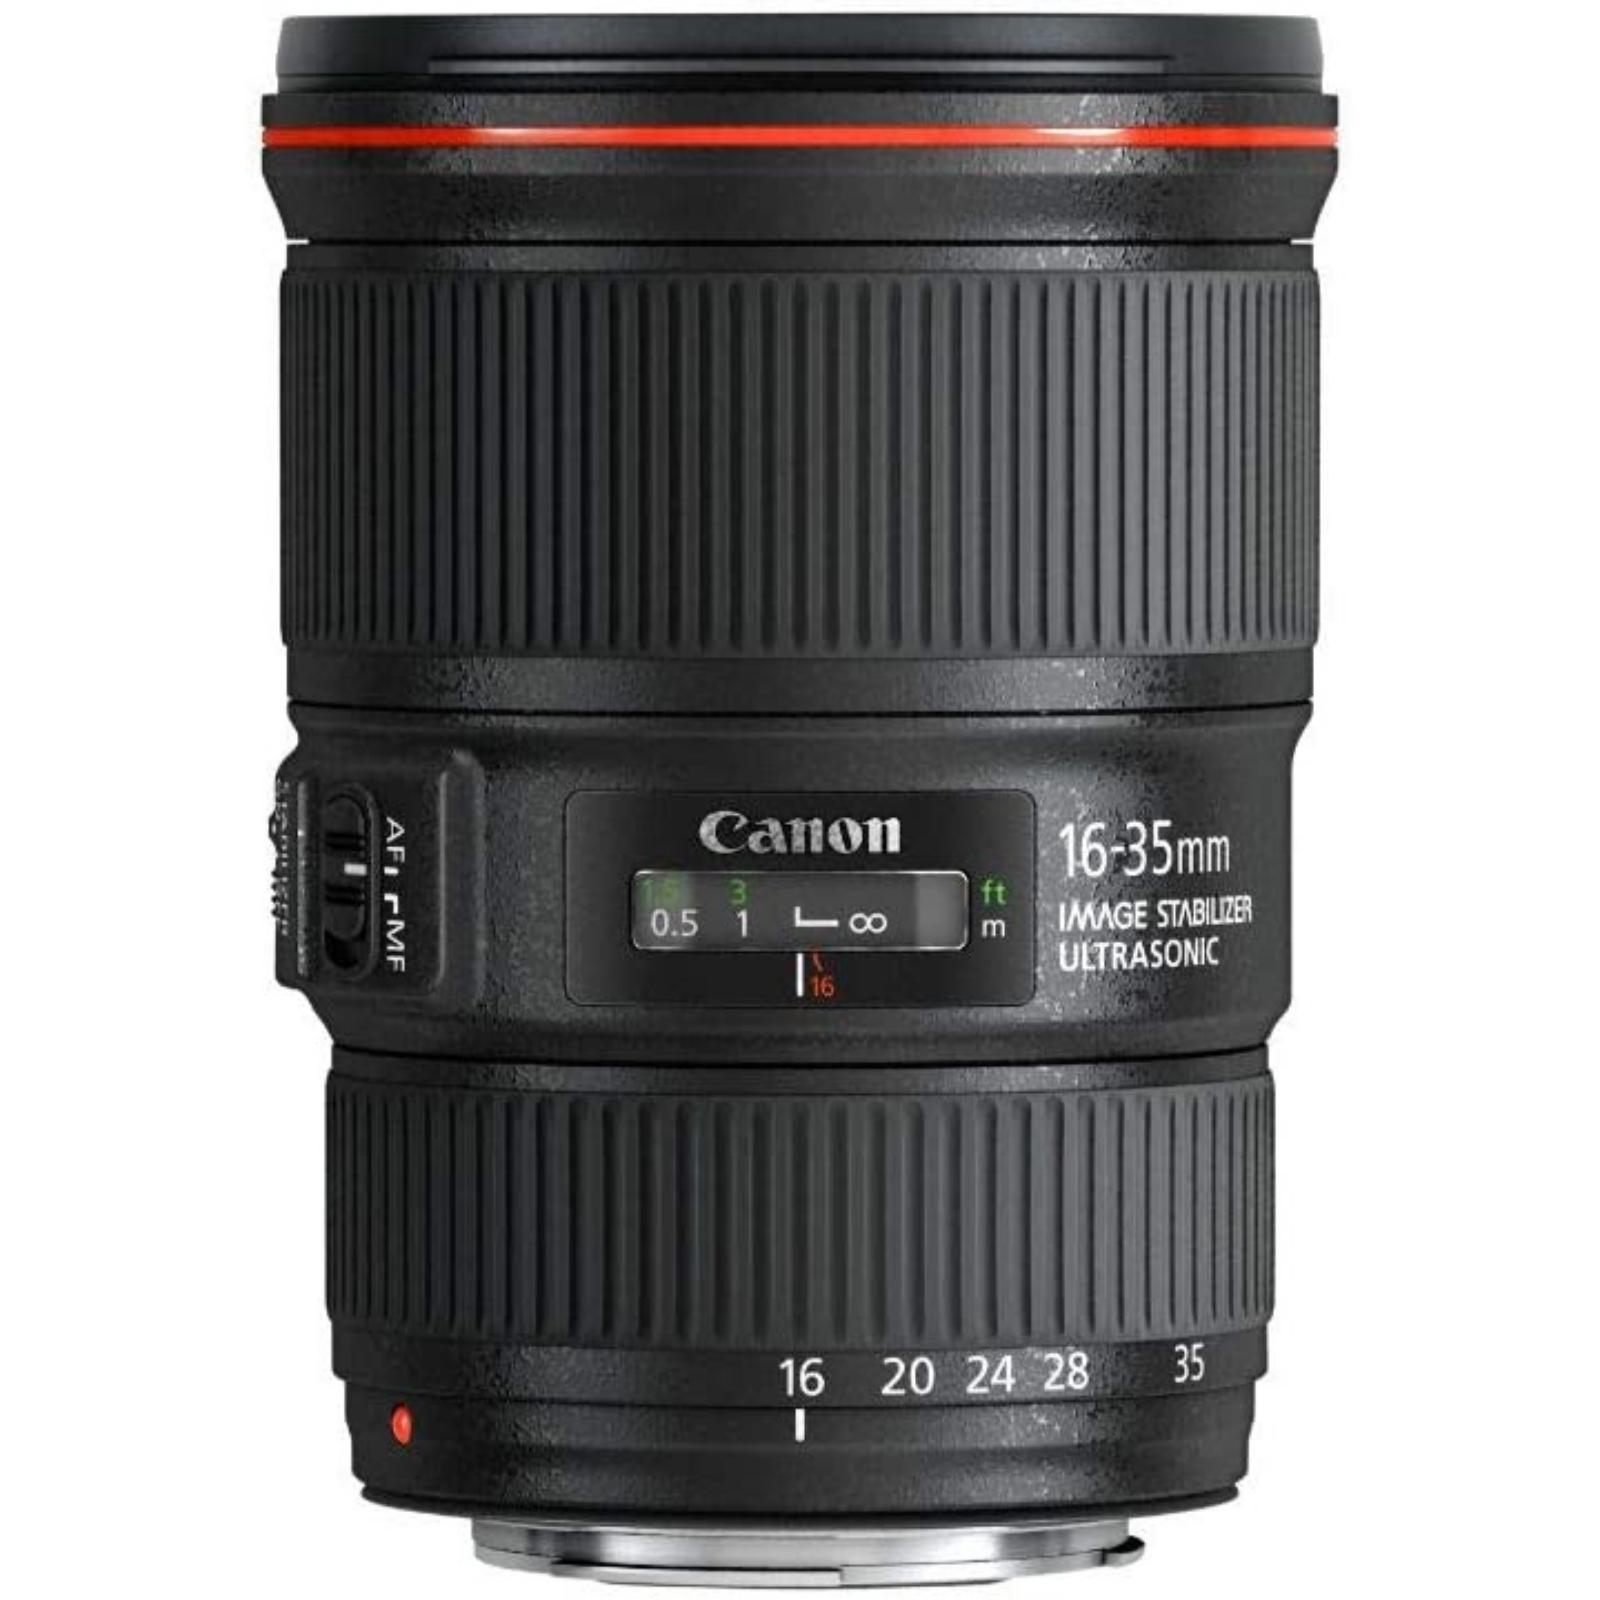 Canon キヤノン 広角ズームレンズ EF16-35mm F4L IS USM ブラック EF16-3540LIS 新品 (並行輸入品、保証付き)